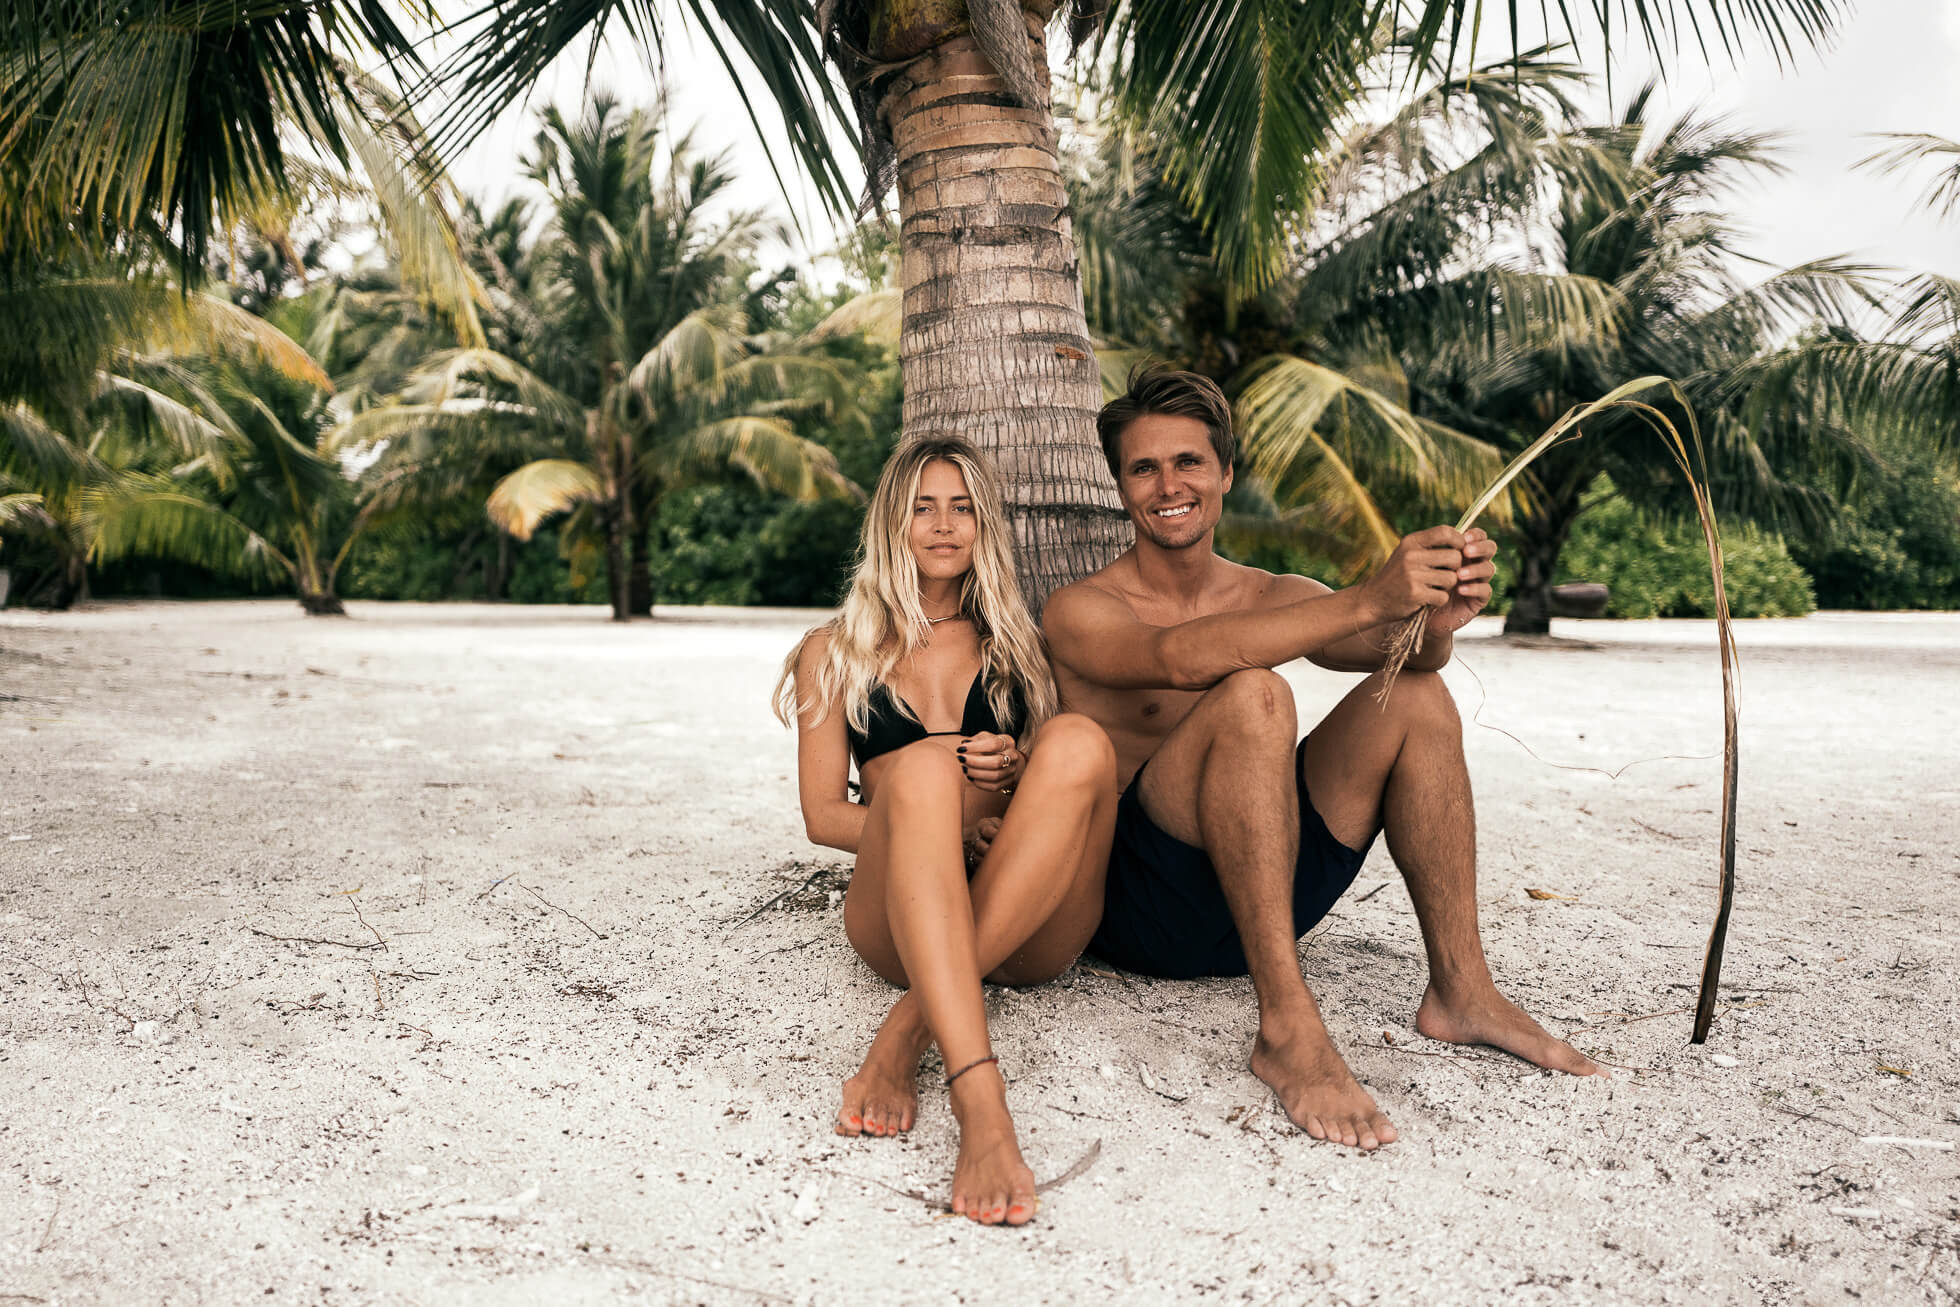 janni-deler-palm-tree-island-maldivesl1130352-redigera-2